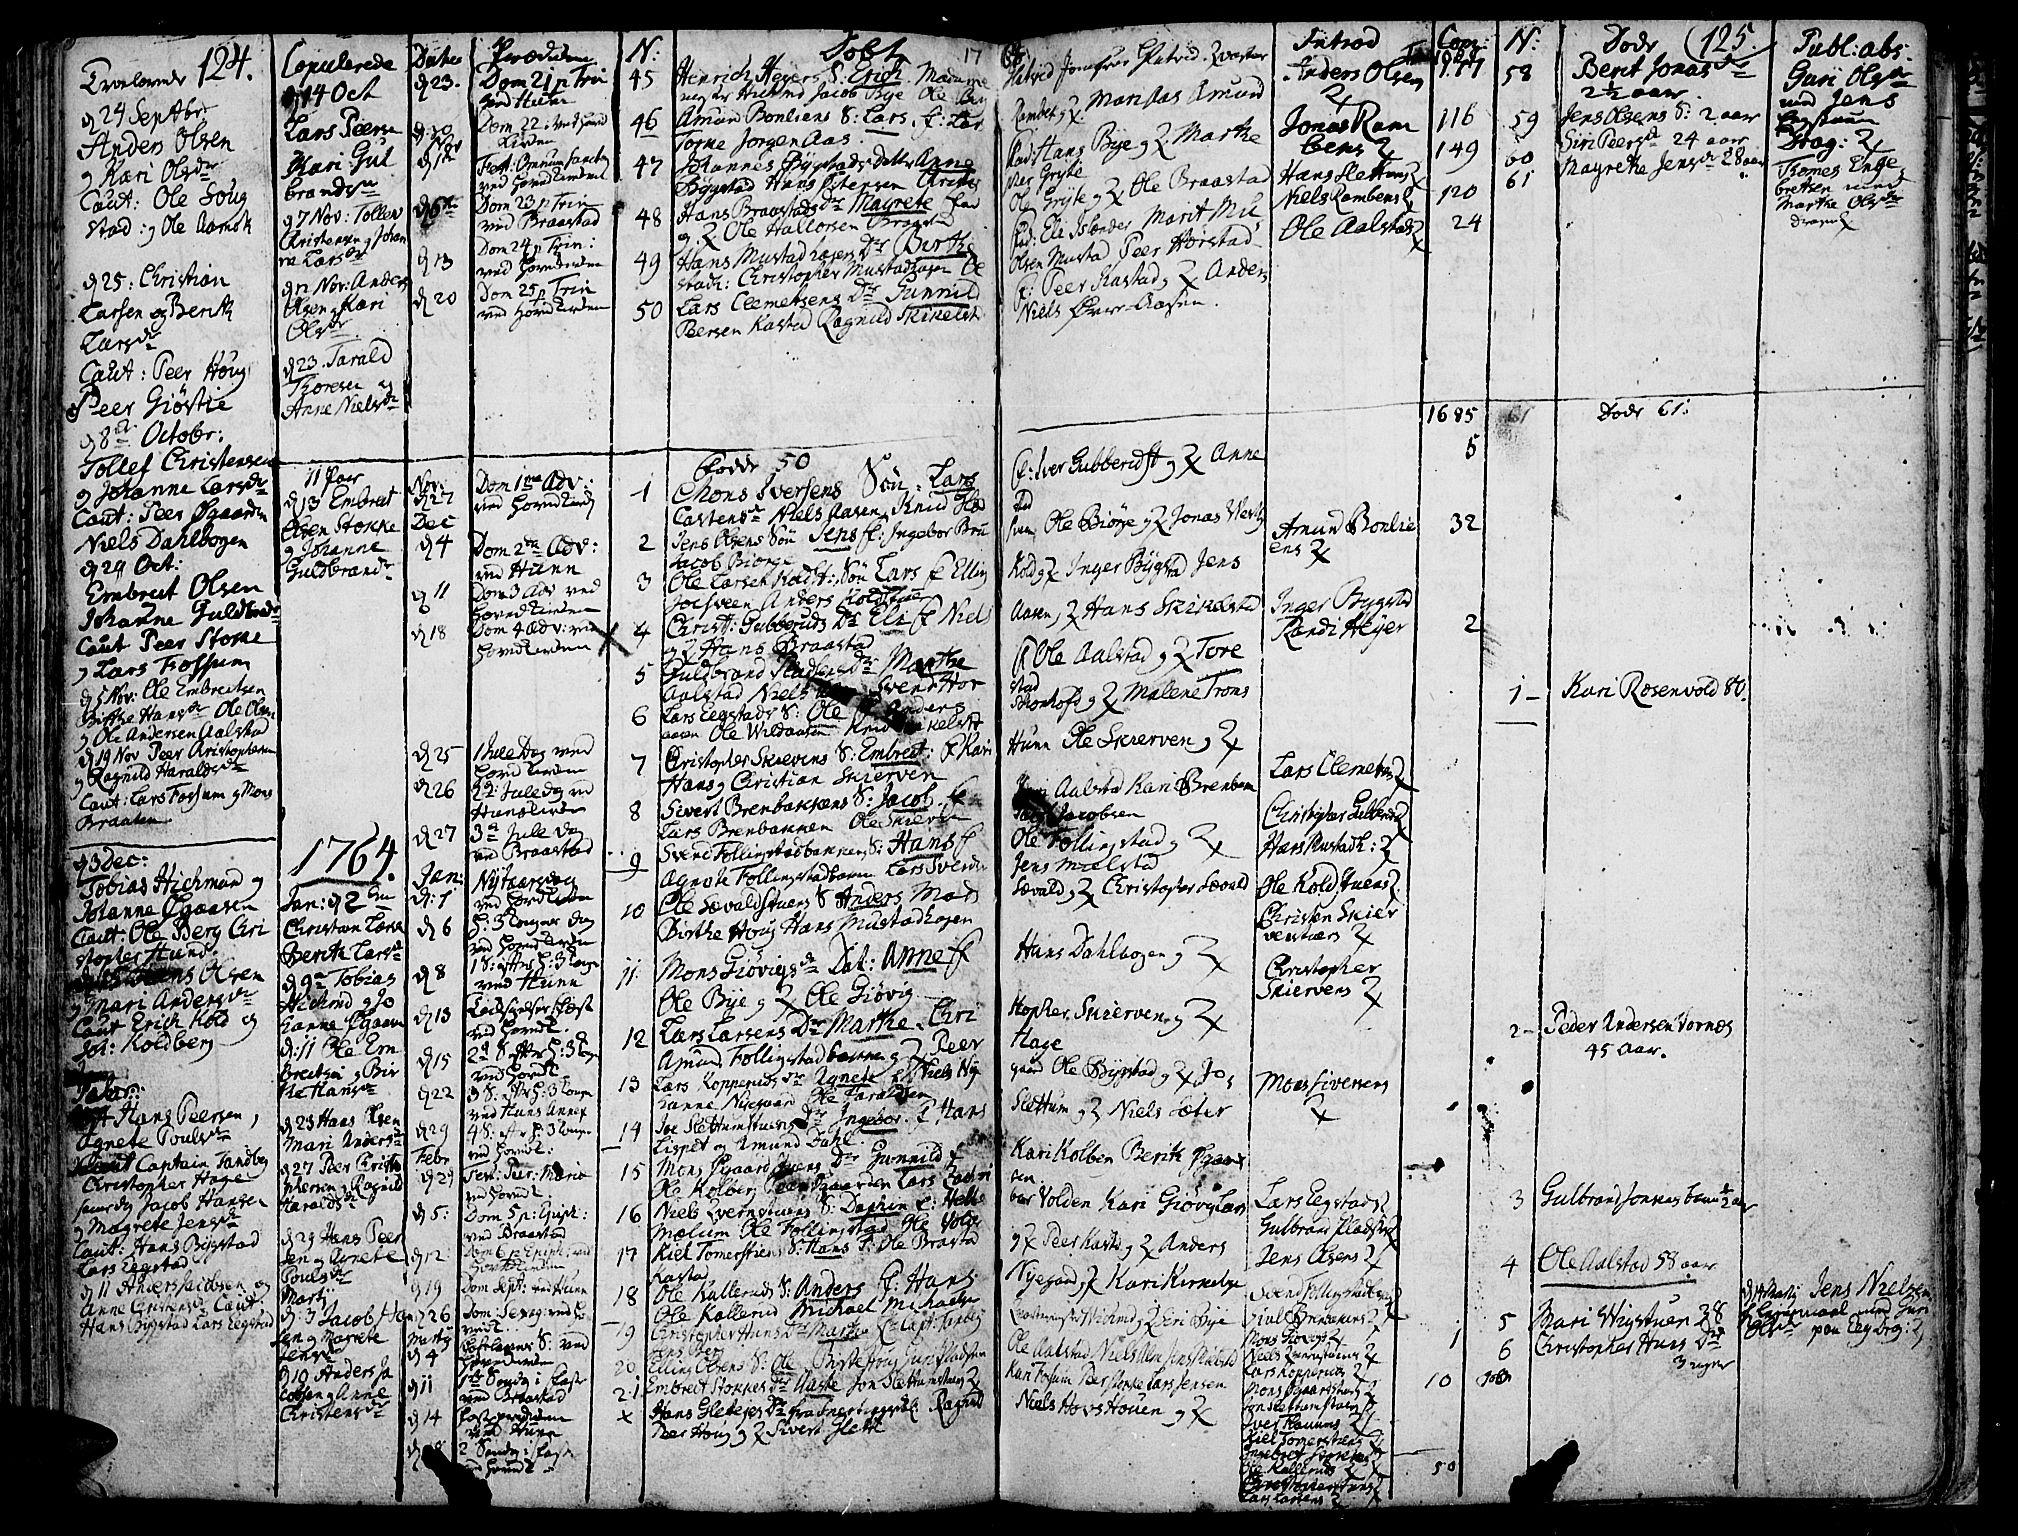 SAH, Vardal prestekontor, H/Ha/Haa/L0002: Ministerialbok nr. 2, 1748-1776, s. 124-125